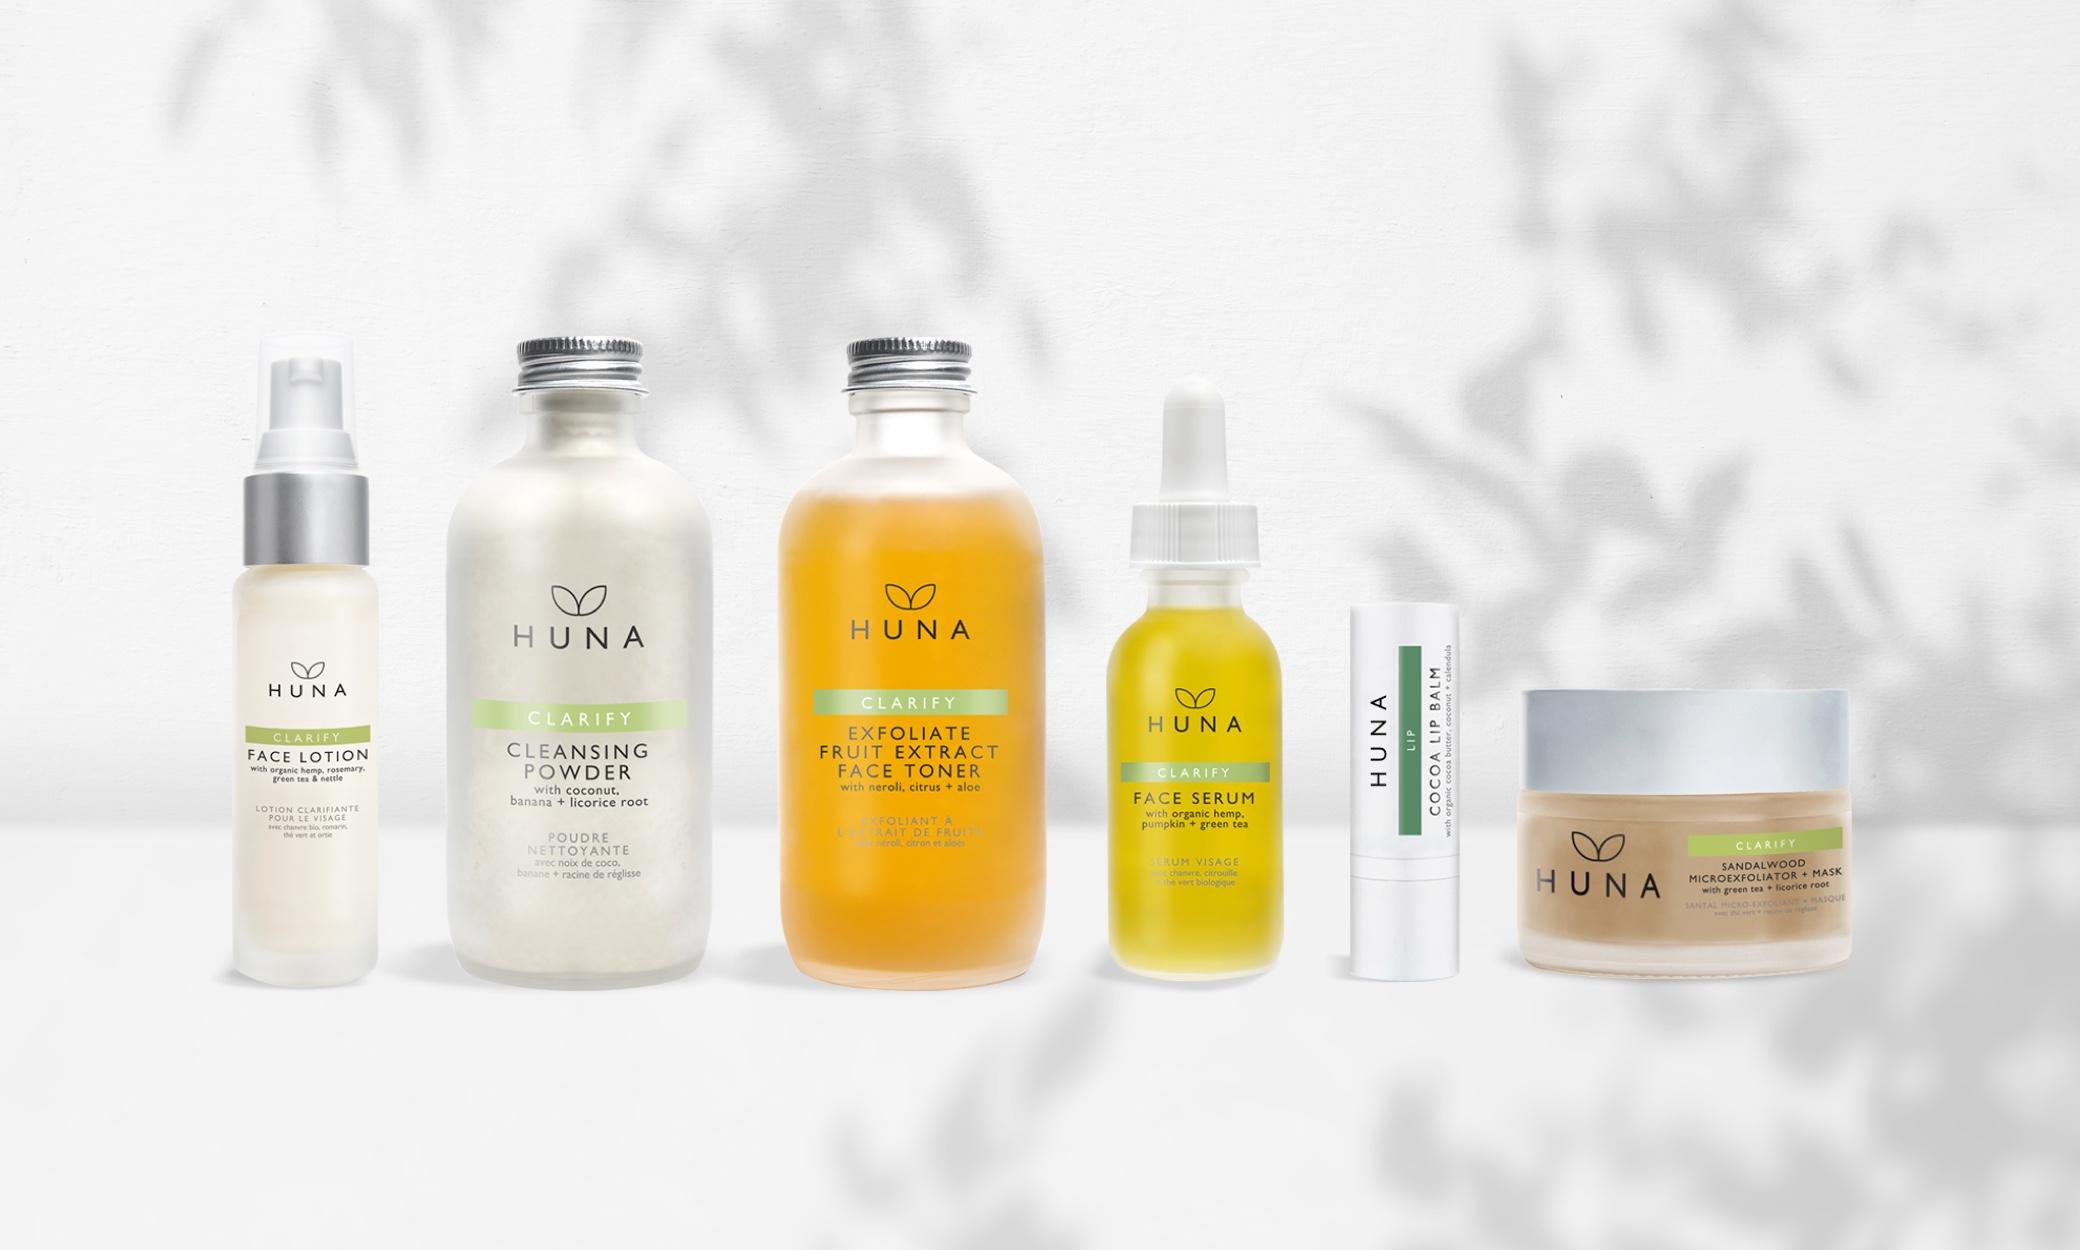 Huna Skin packaging